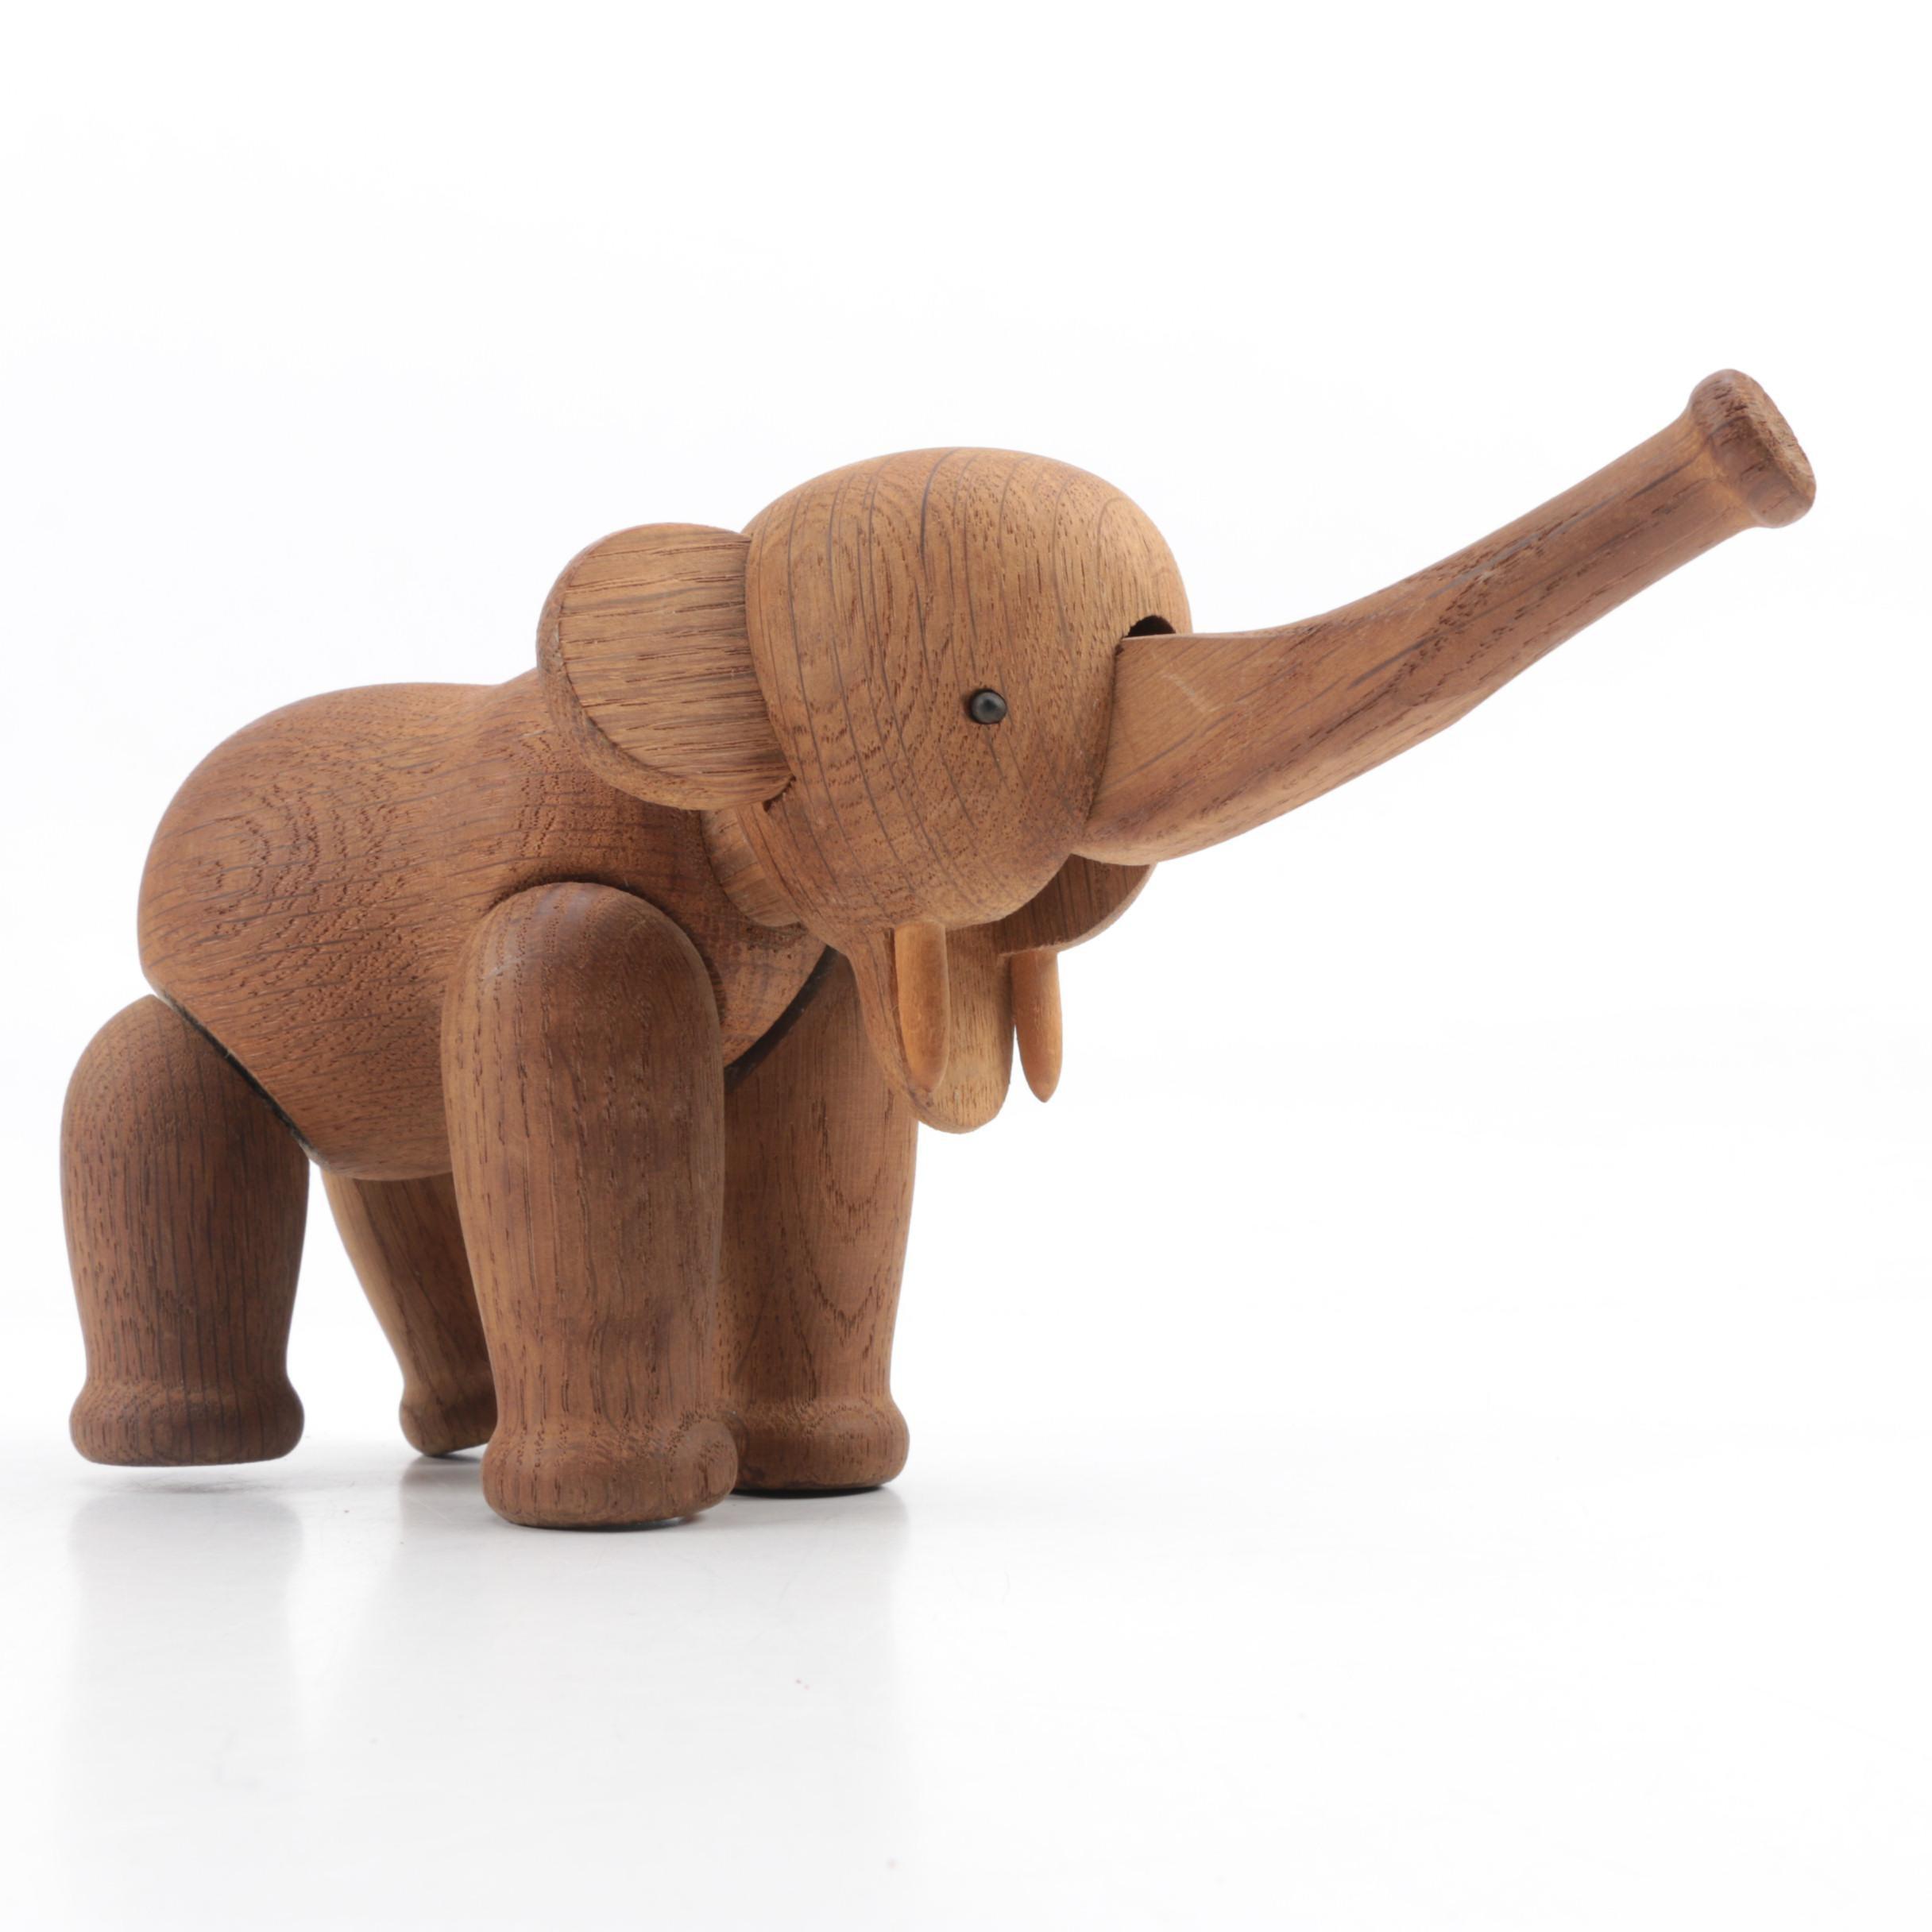 Kay Bojessen Wooden Elephant Figurine